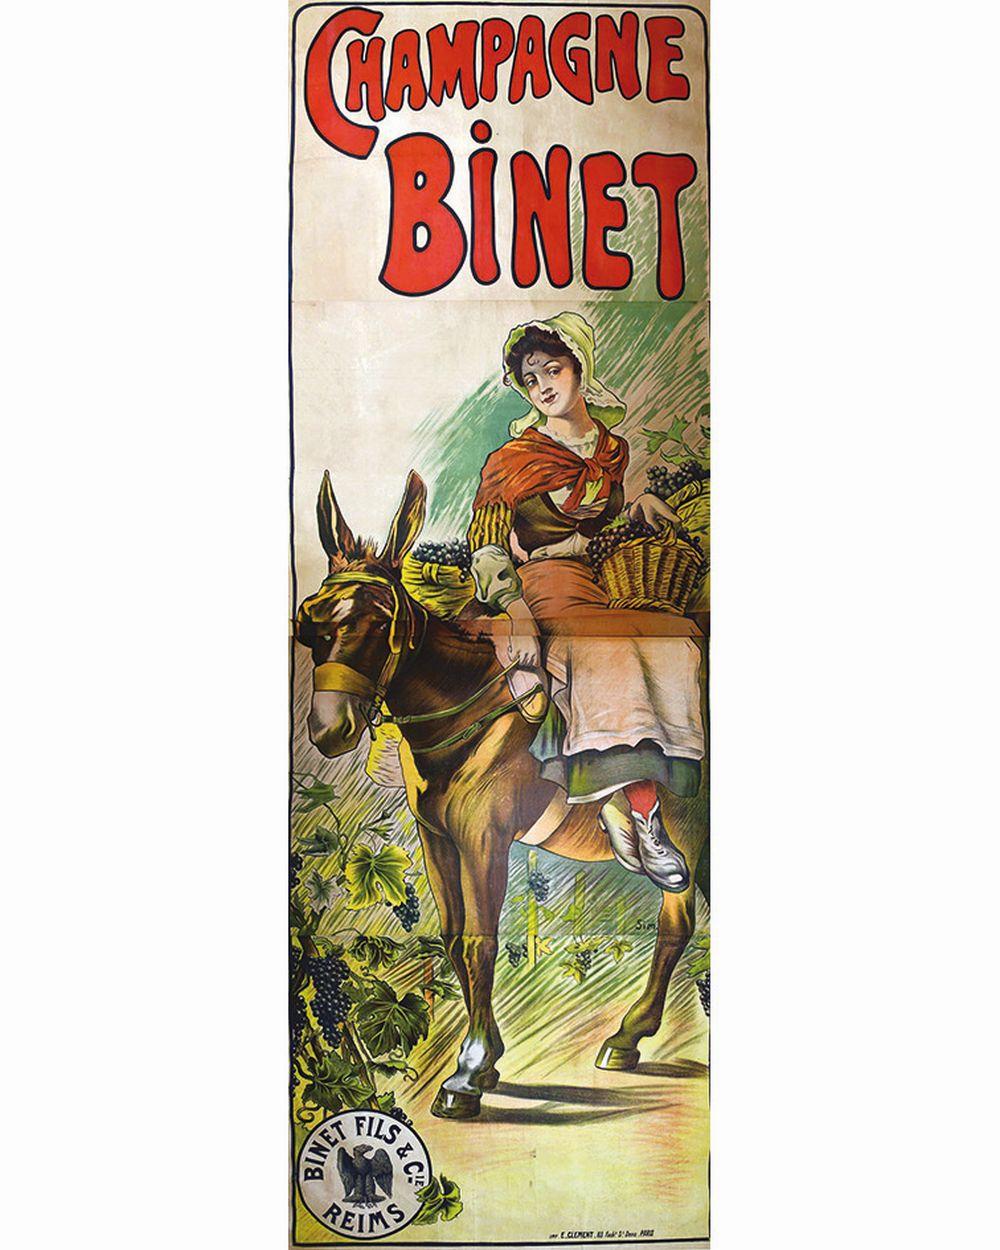 SIM - Champagne Binet     vers 1890  Reims (Marne)